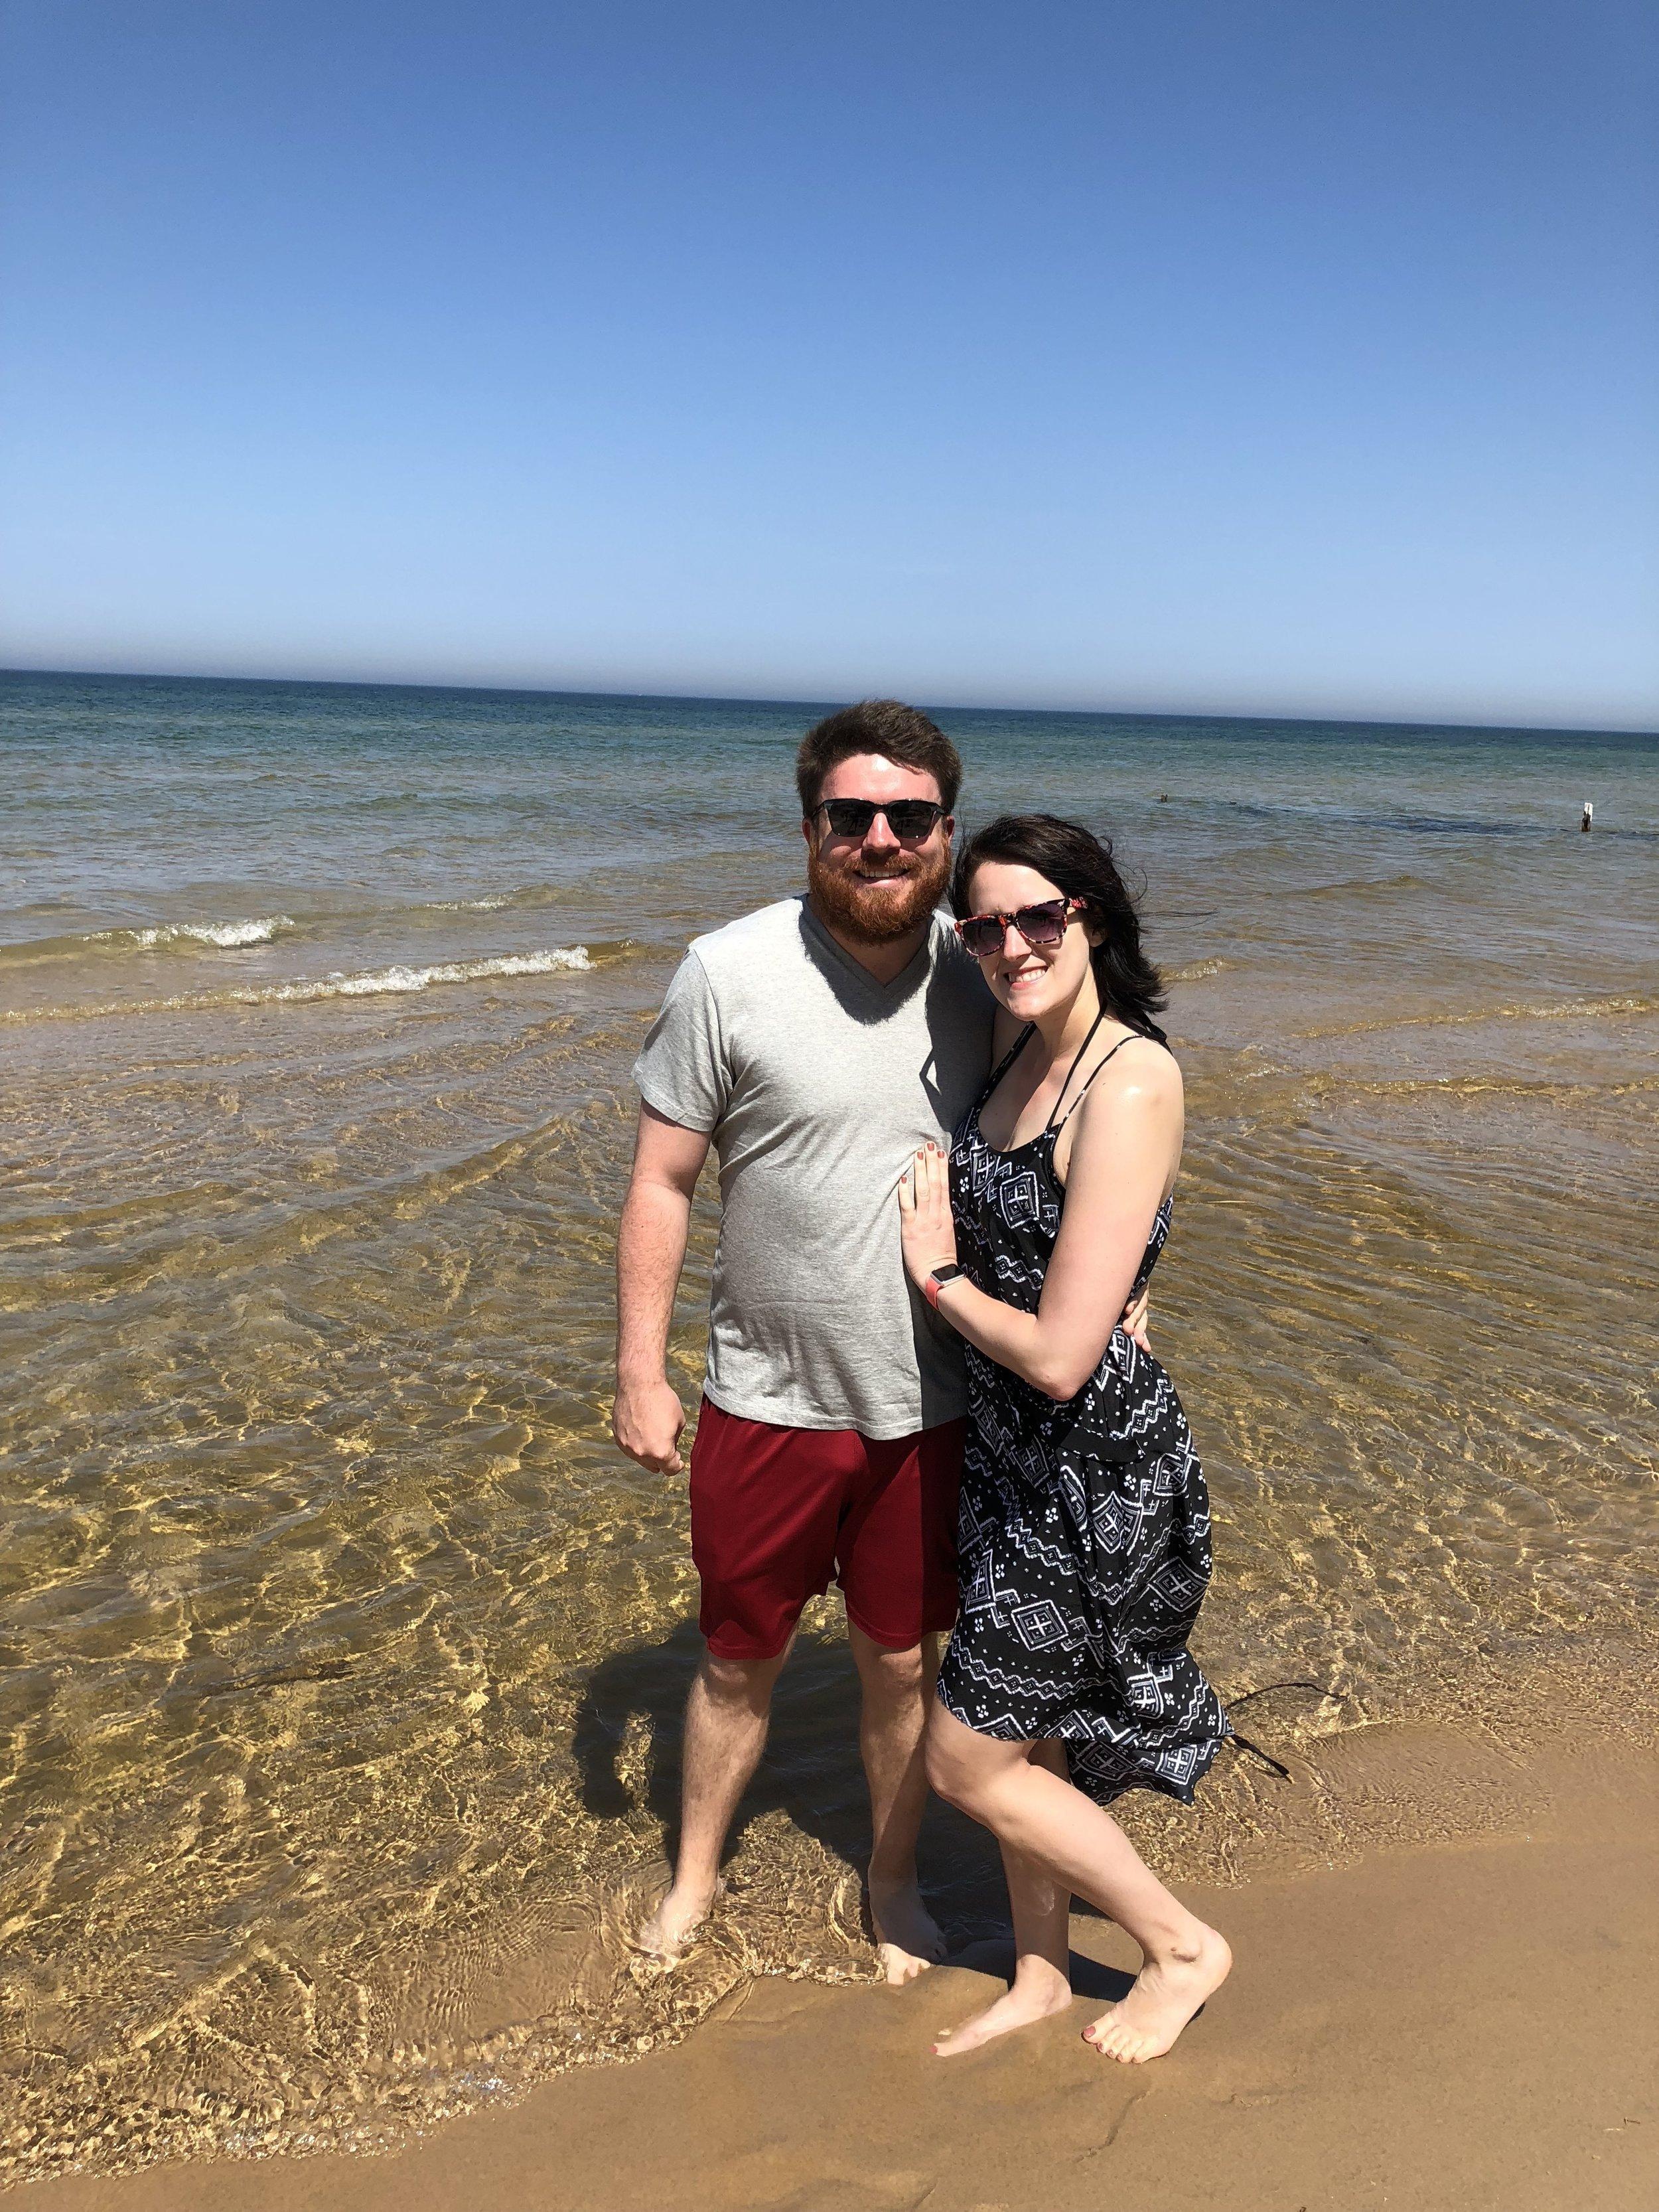 Ohio Wedding Photographers Travel to Muskegon for Destination Engagement Session